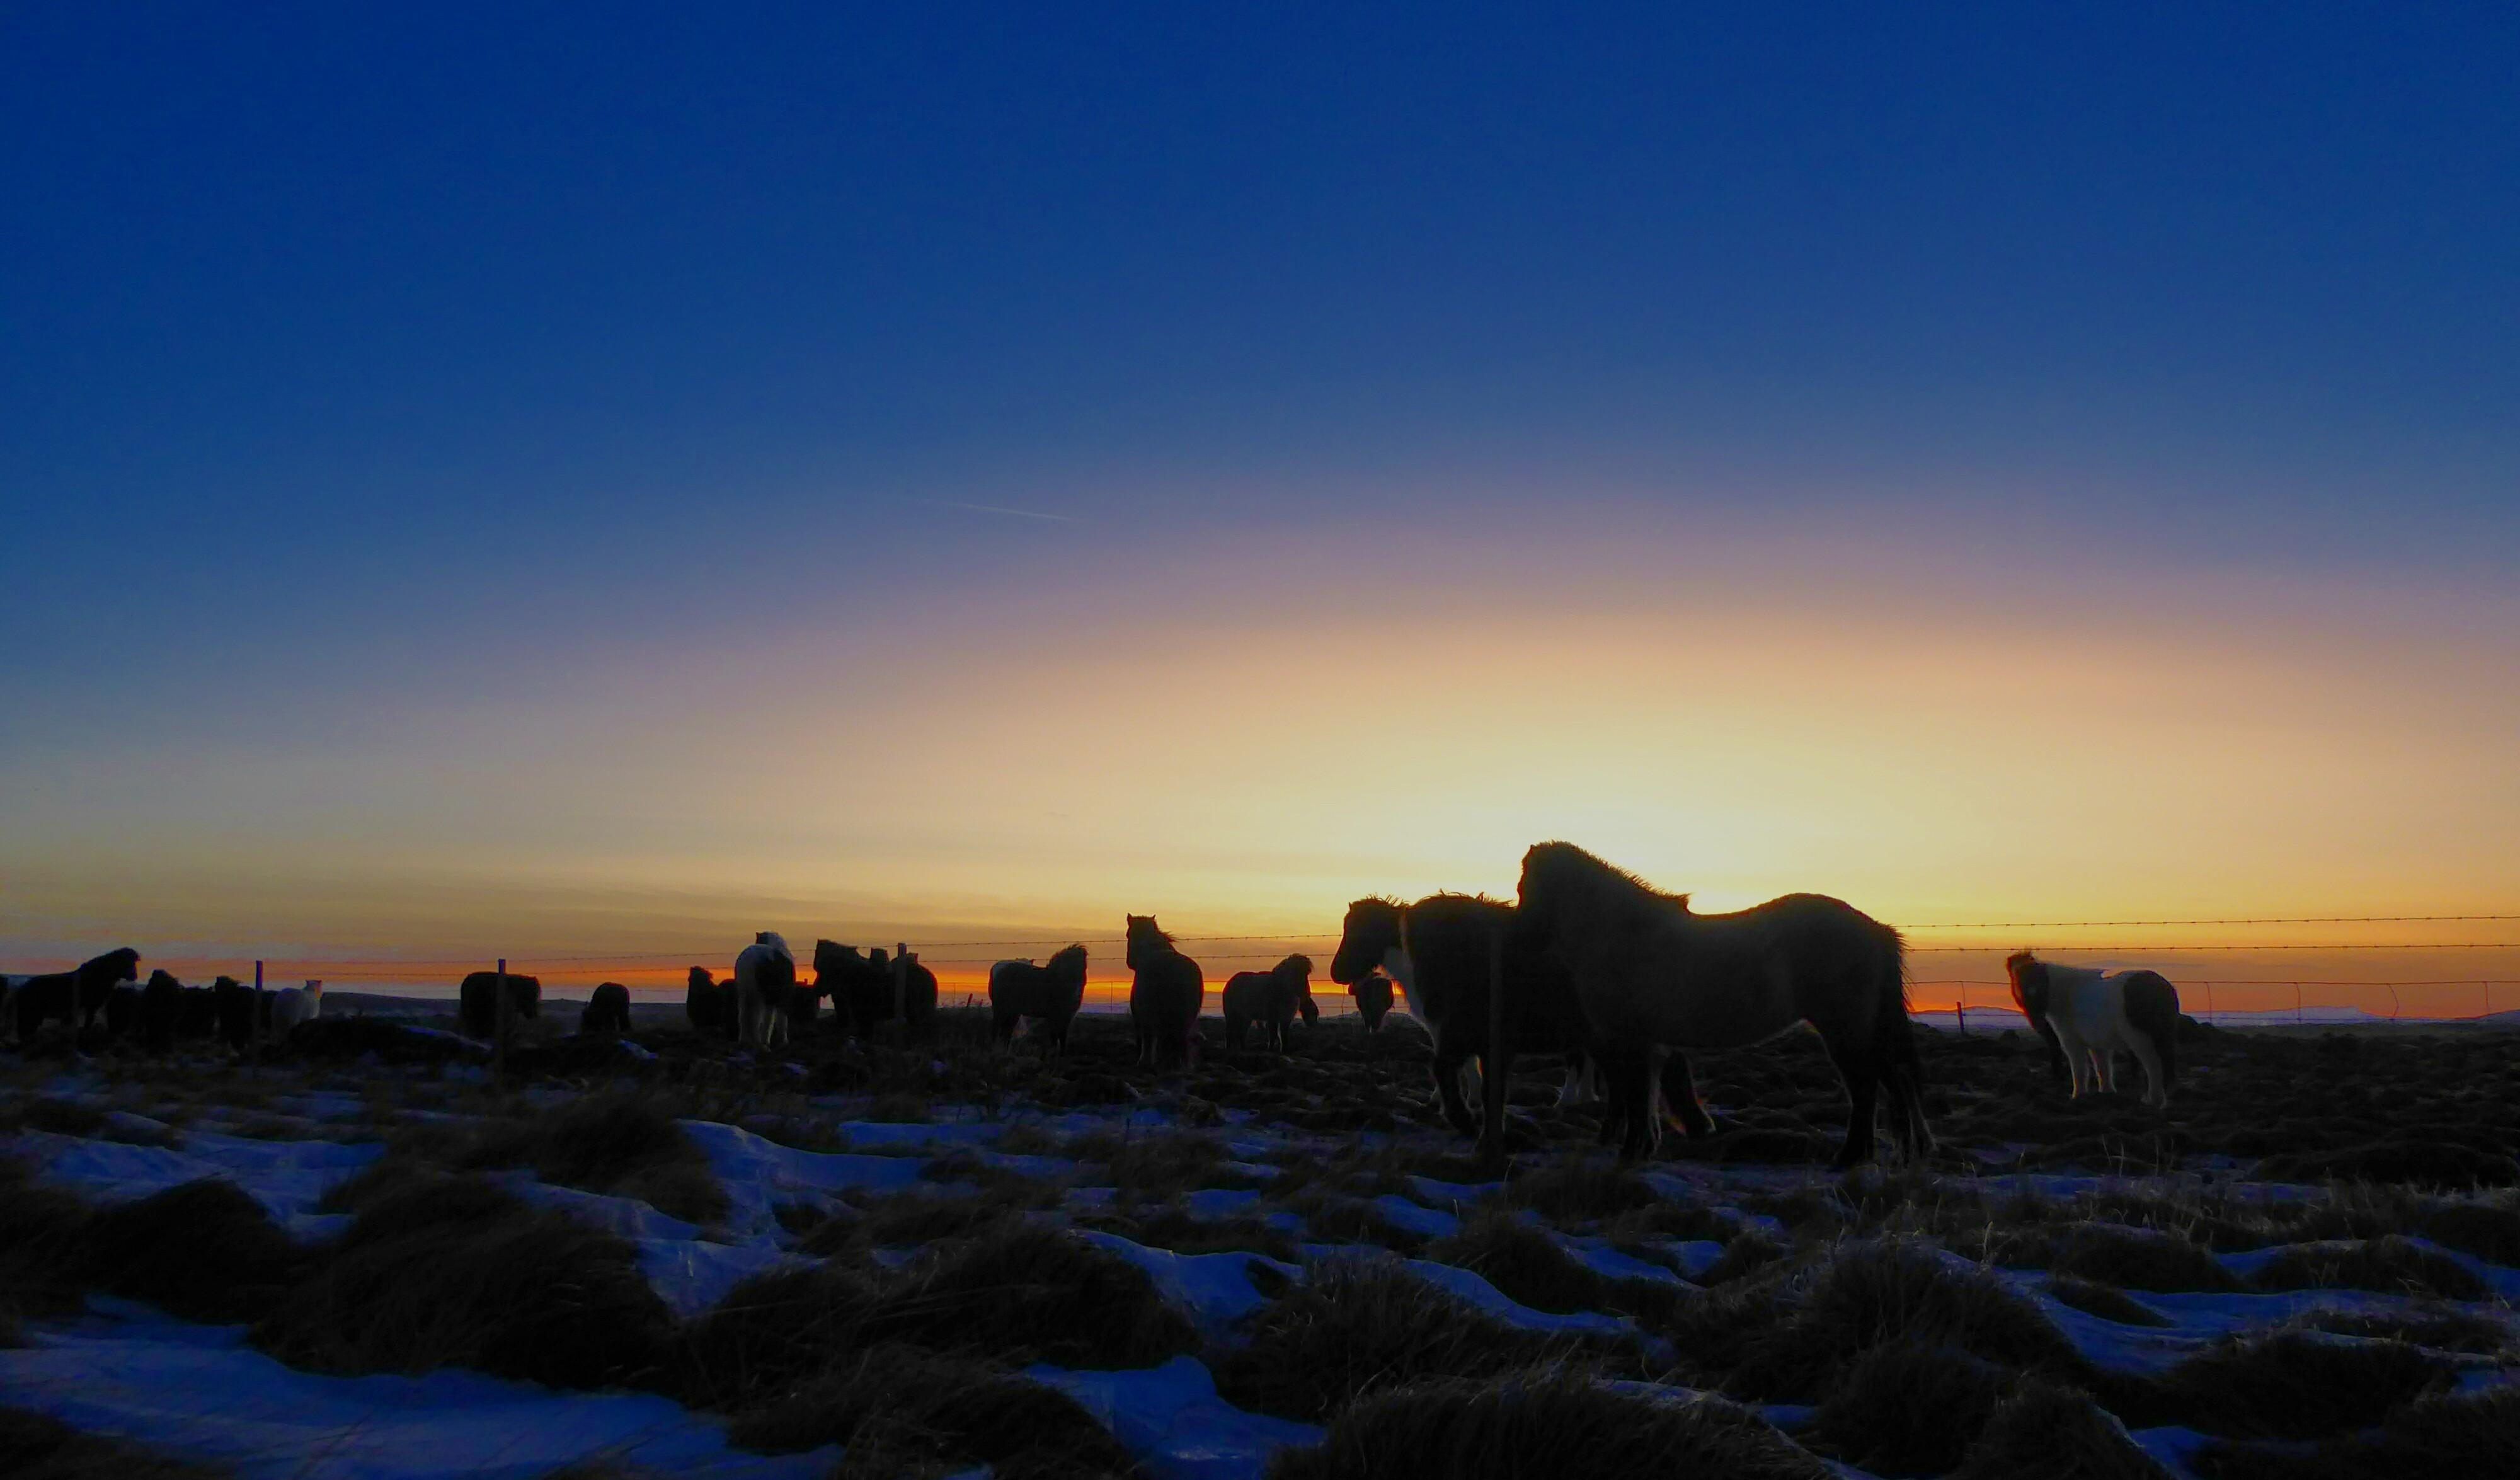 Postcard - Iceland - Icelandic Horses